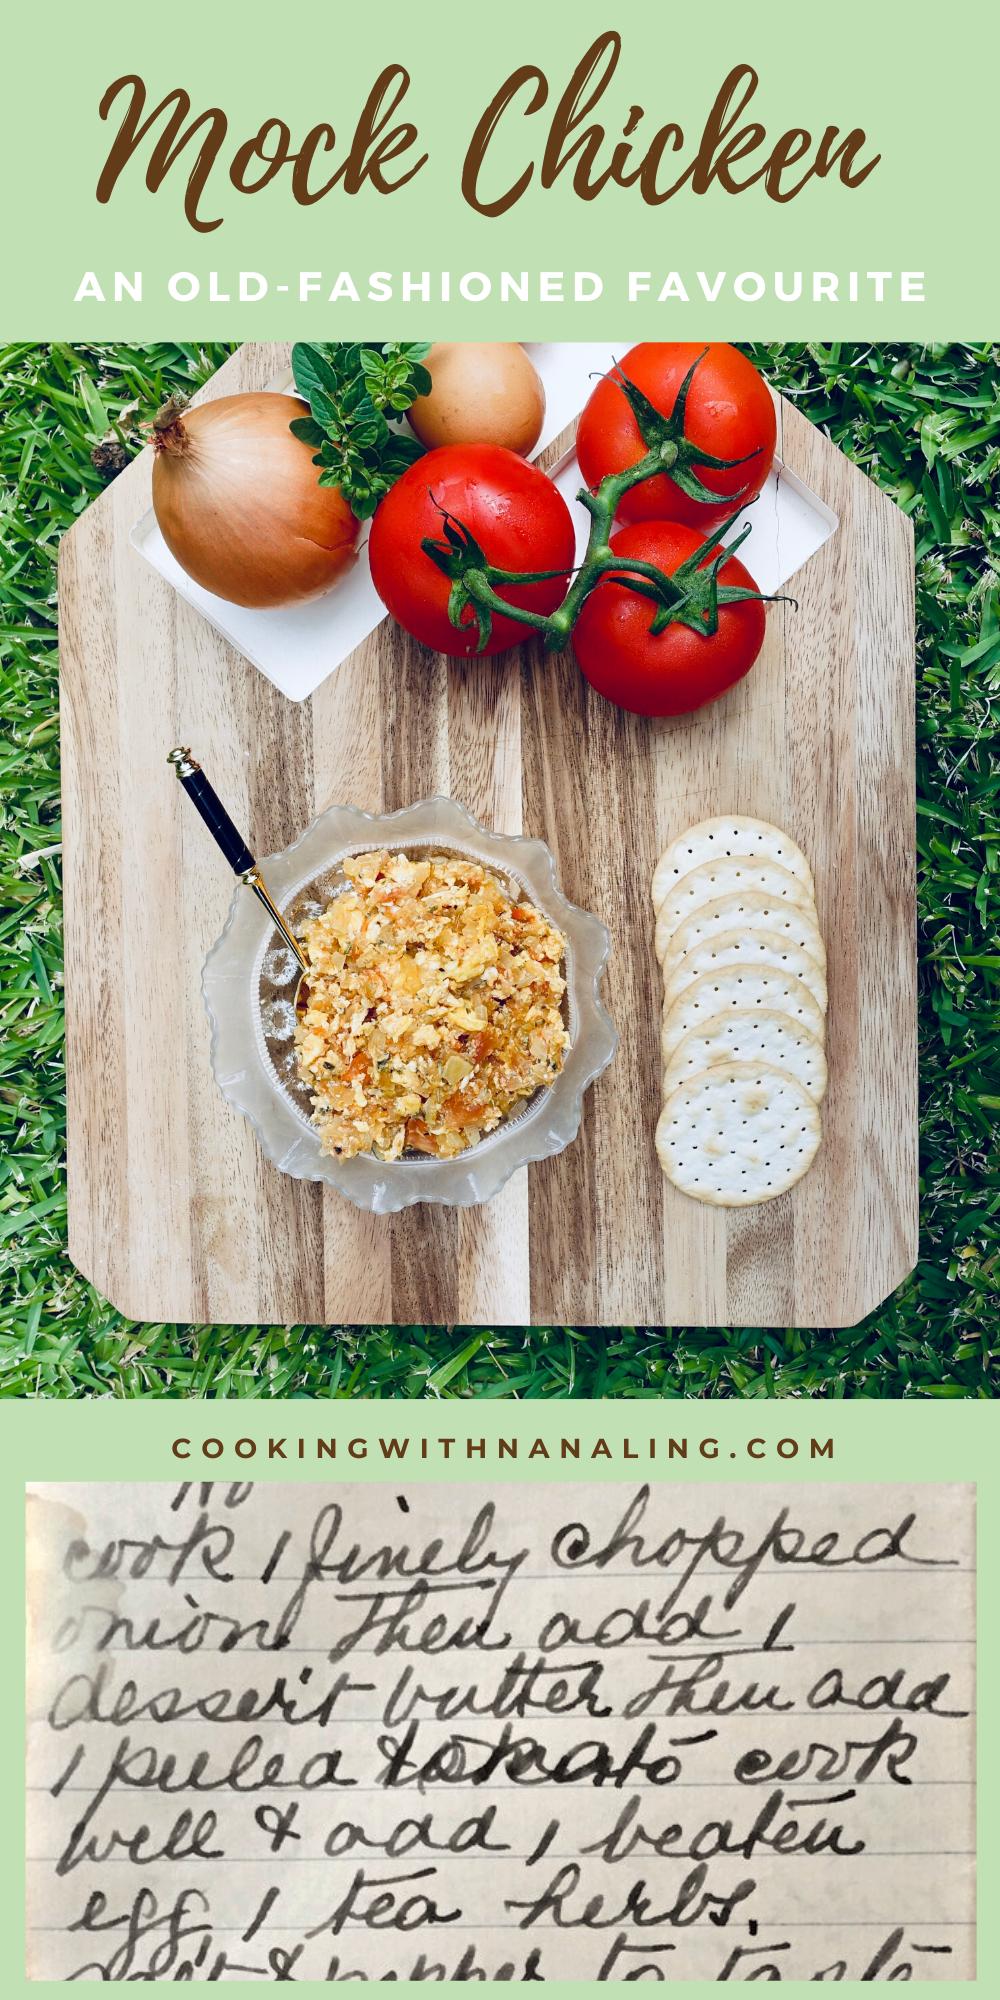 Mock Chicken Treasured Family Recipe Cooking With Nana Ling Recipe Mock Chicken Cooking Recipes Recipes